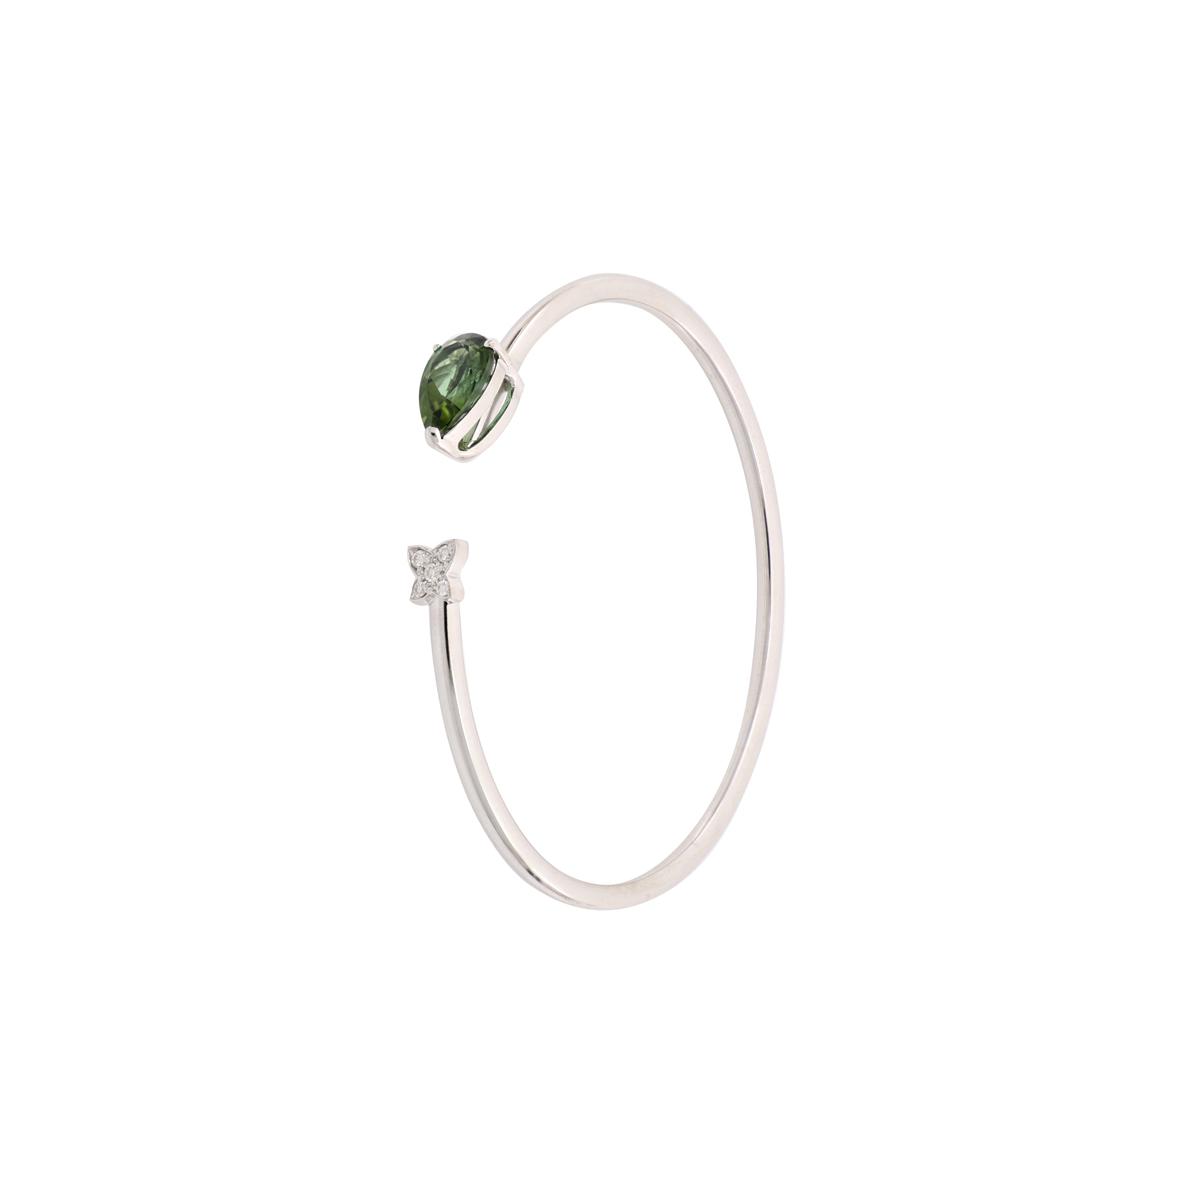 Green Tourmaline Open-Cuff Bangle Bracelet